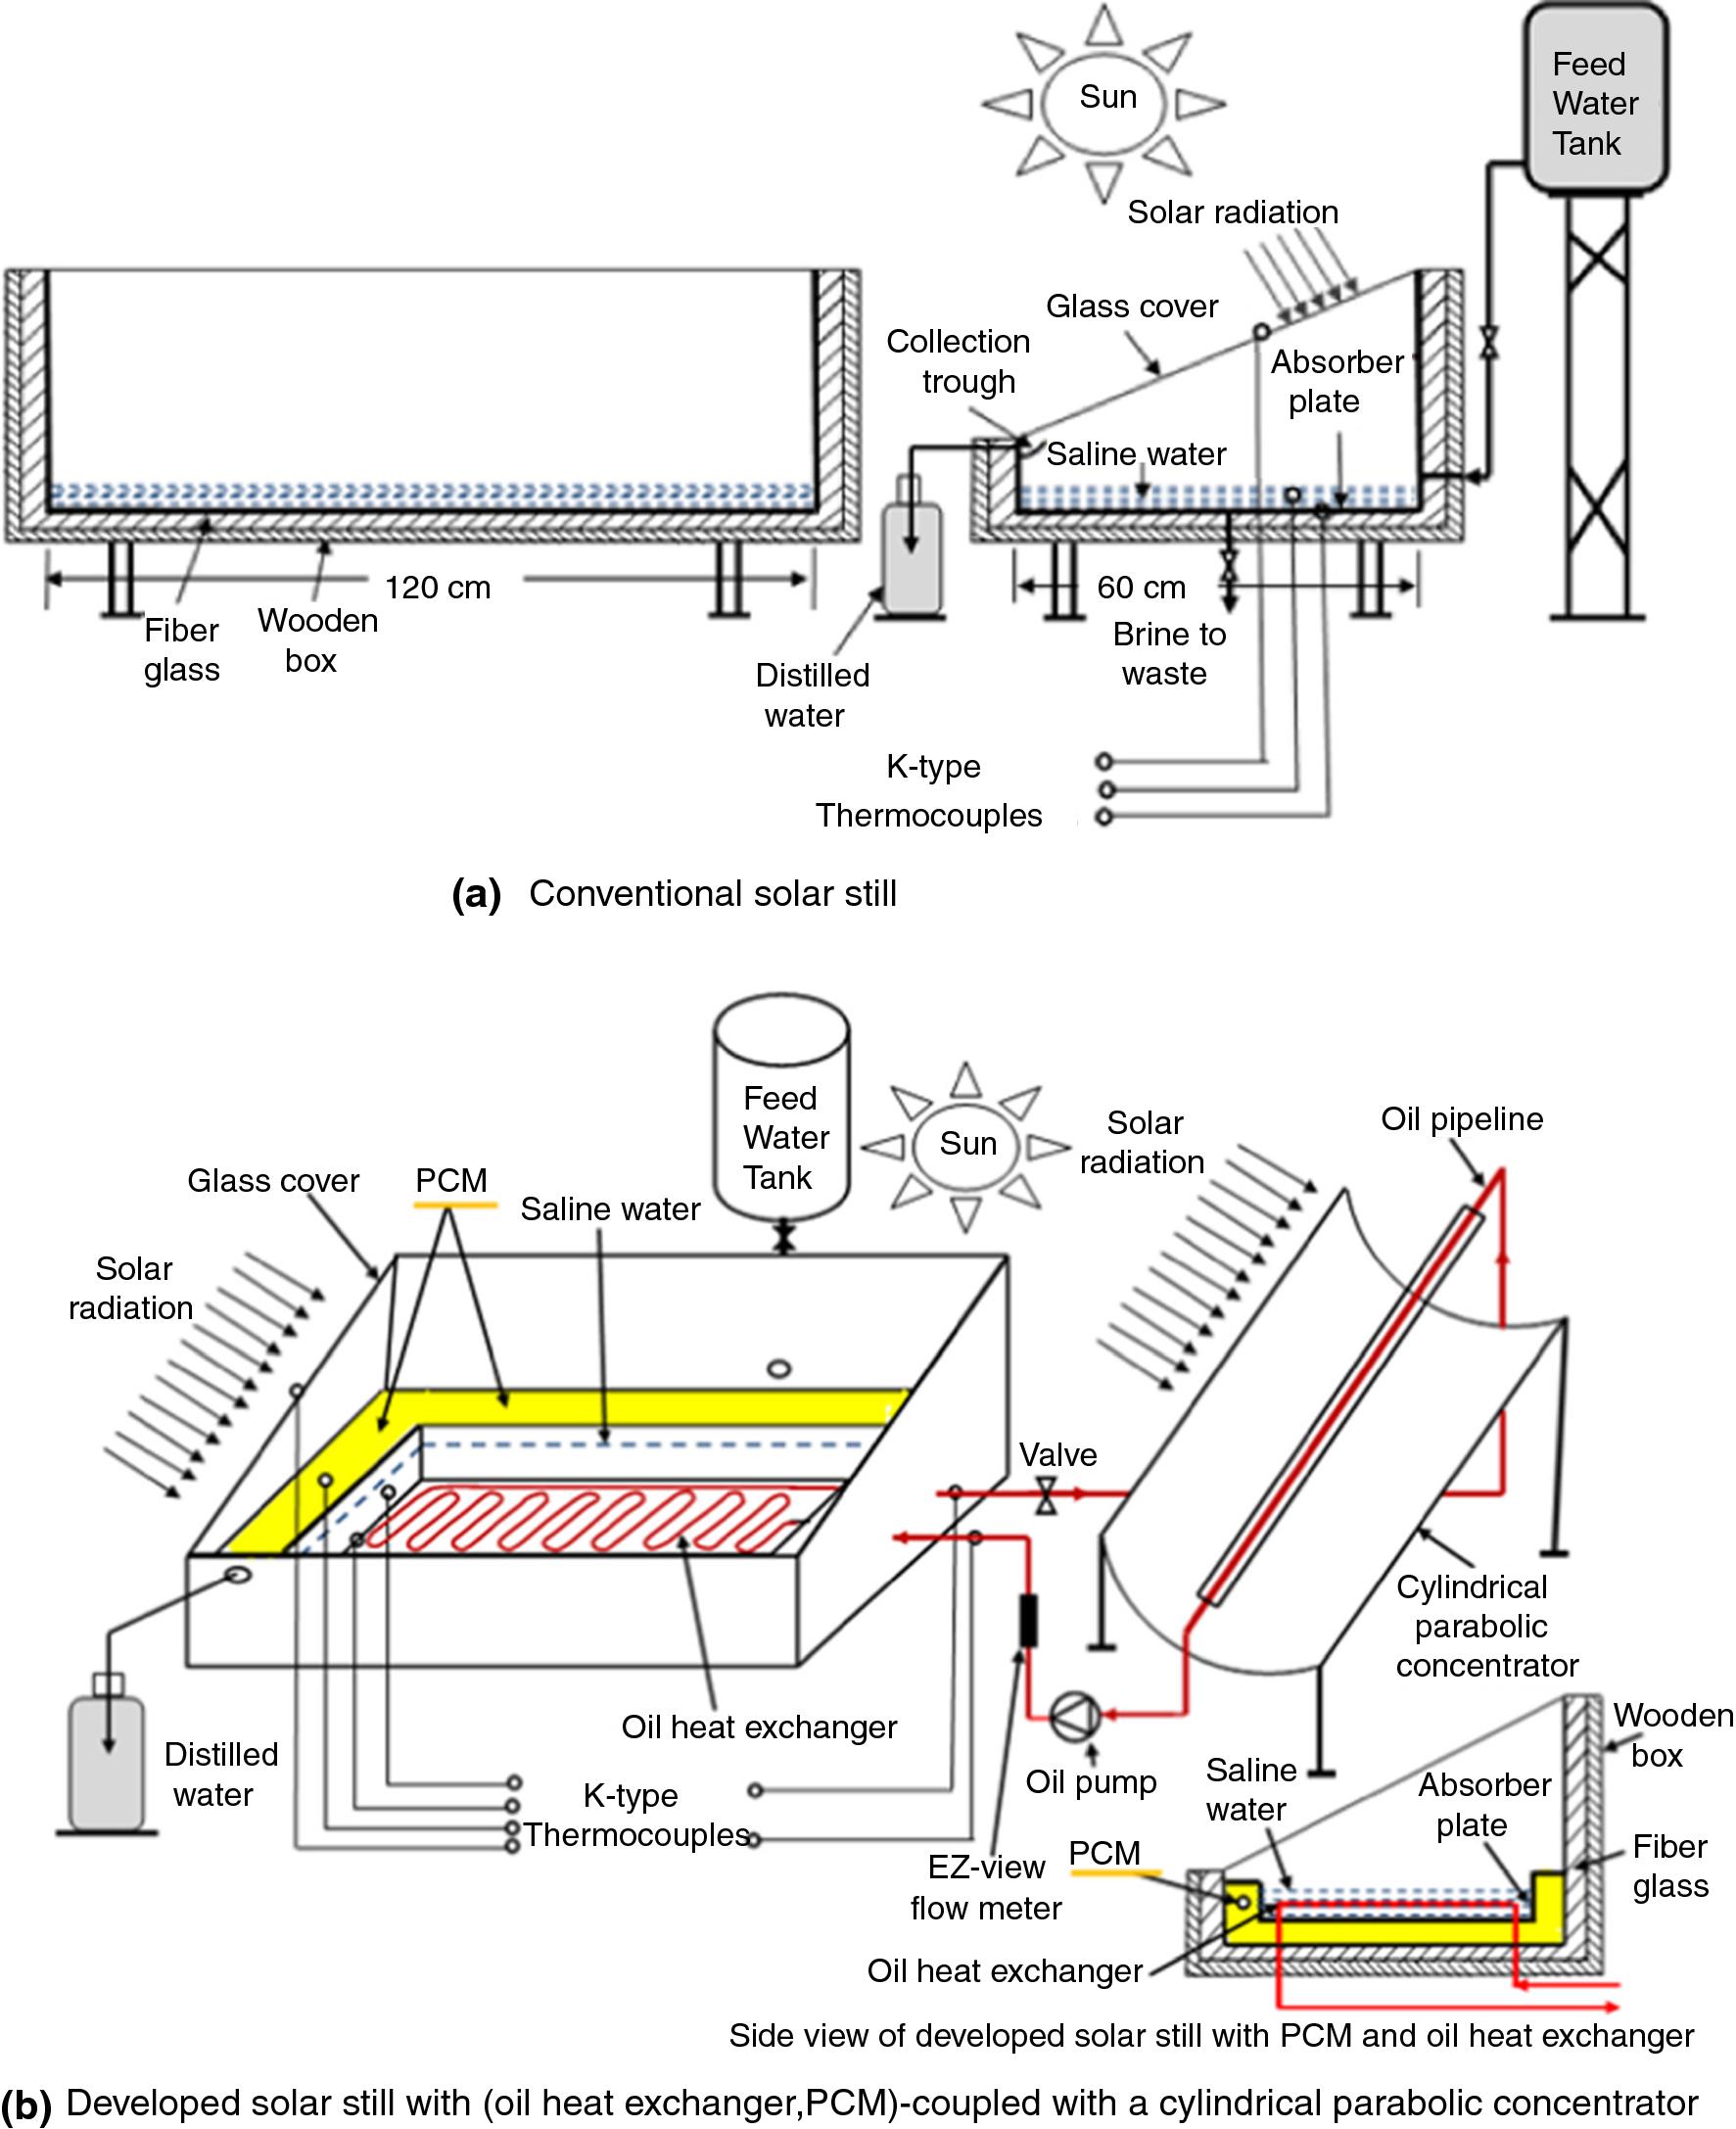 Phase change materials (PCMs) for improving solar still